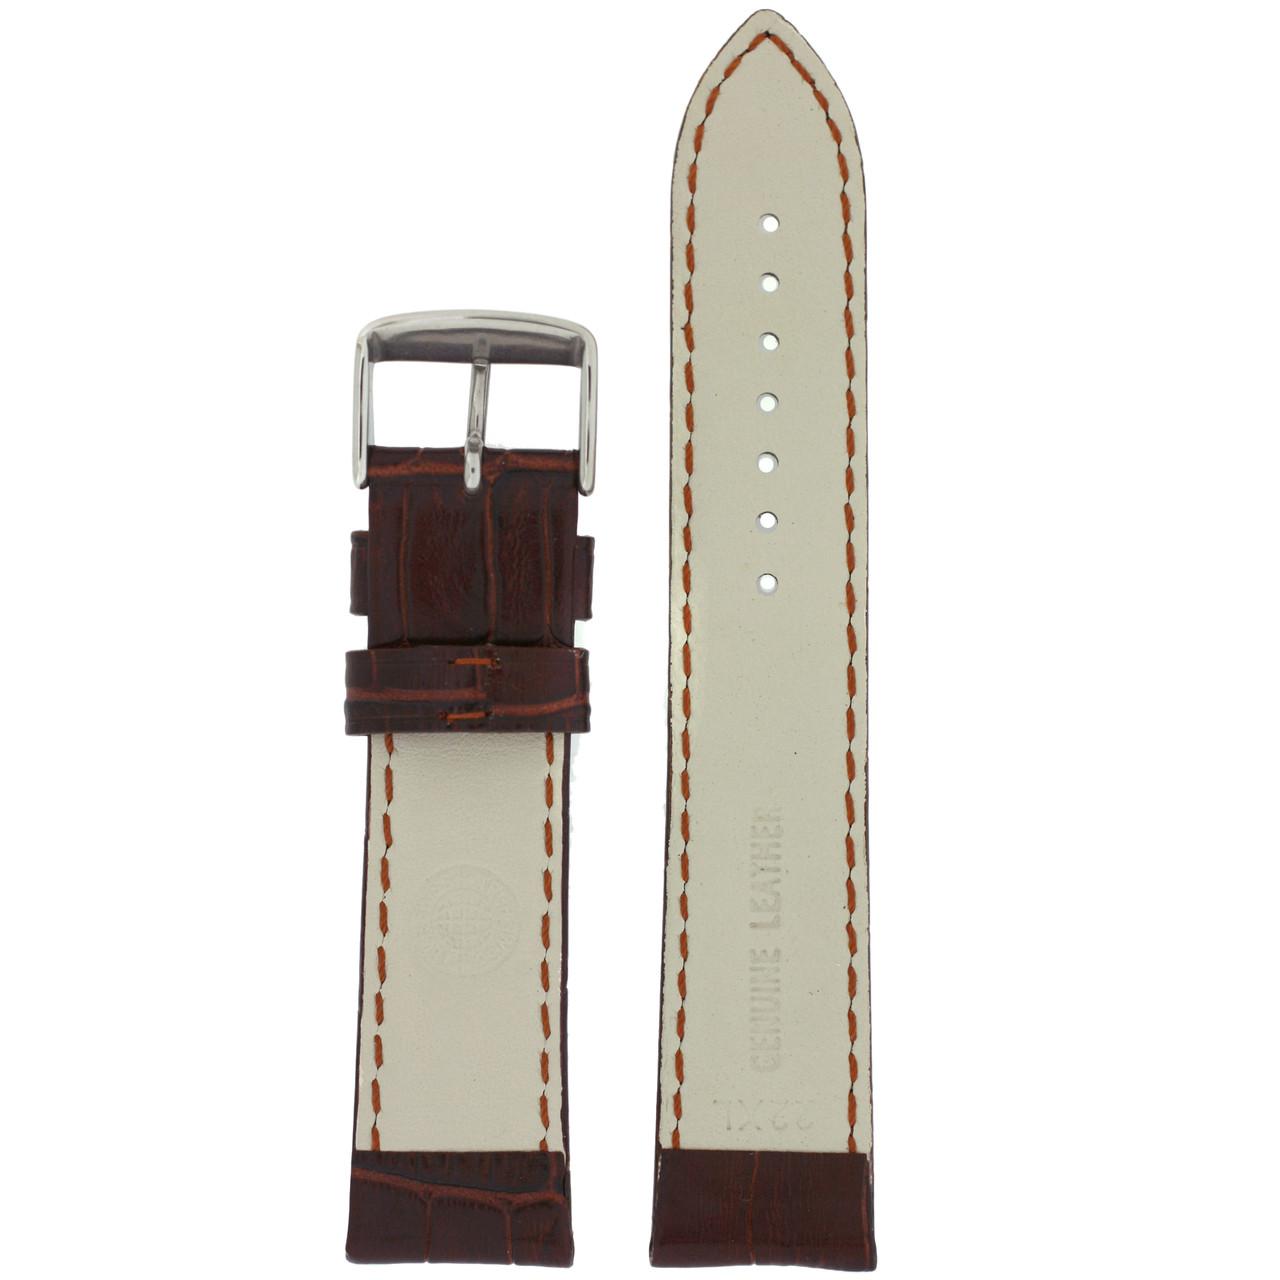 Extra Long Leather Crocodiledile Grain Watch Band - Bottom View - Main